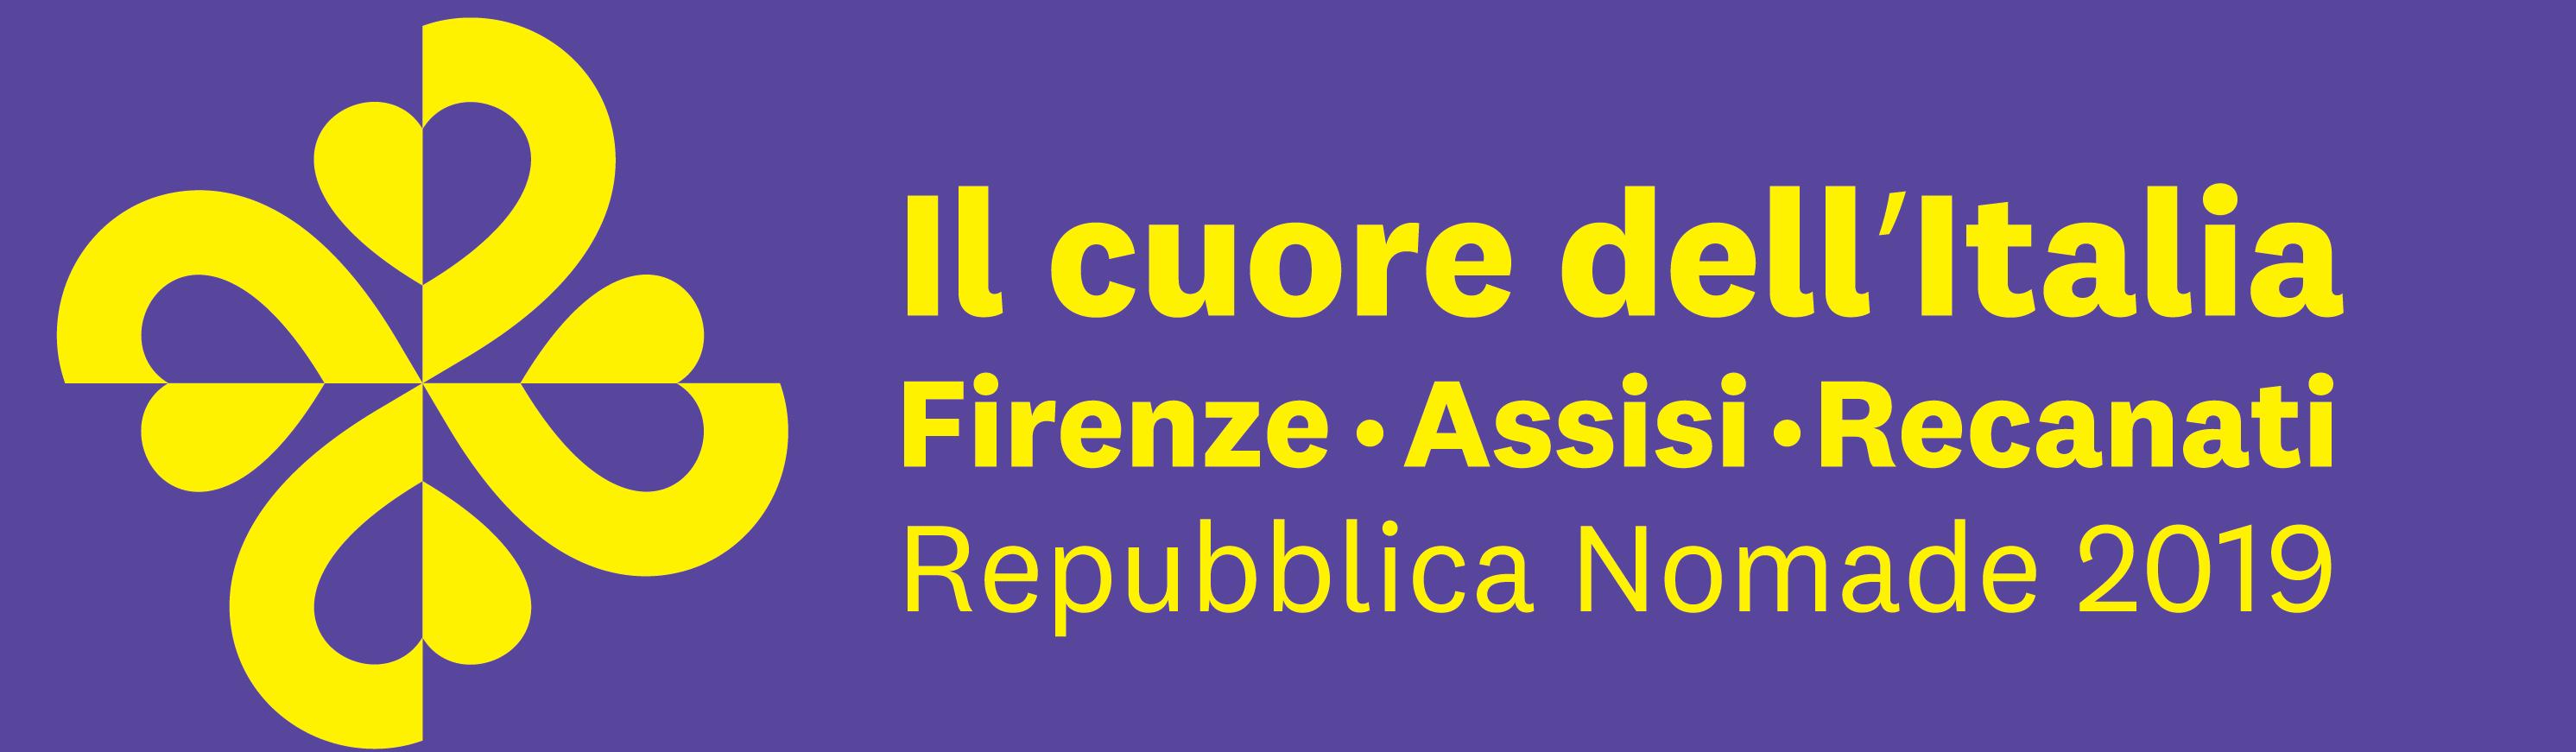 Italia Calendario.Calendario E Tappe Repubblica Nomade